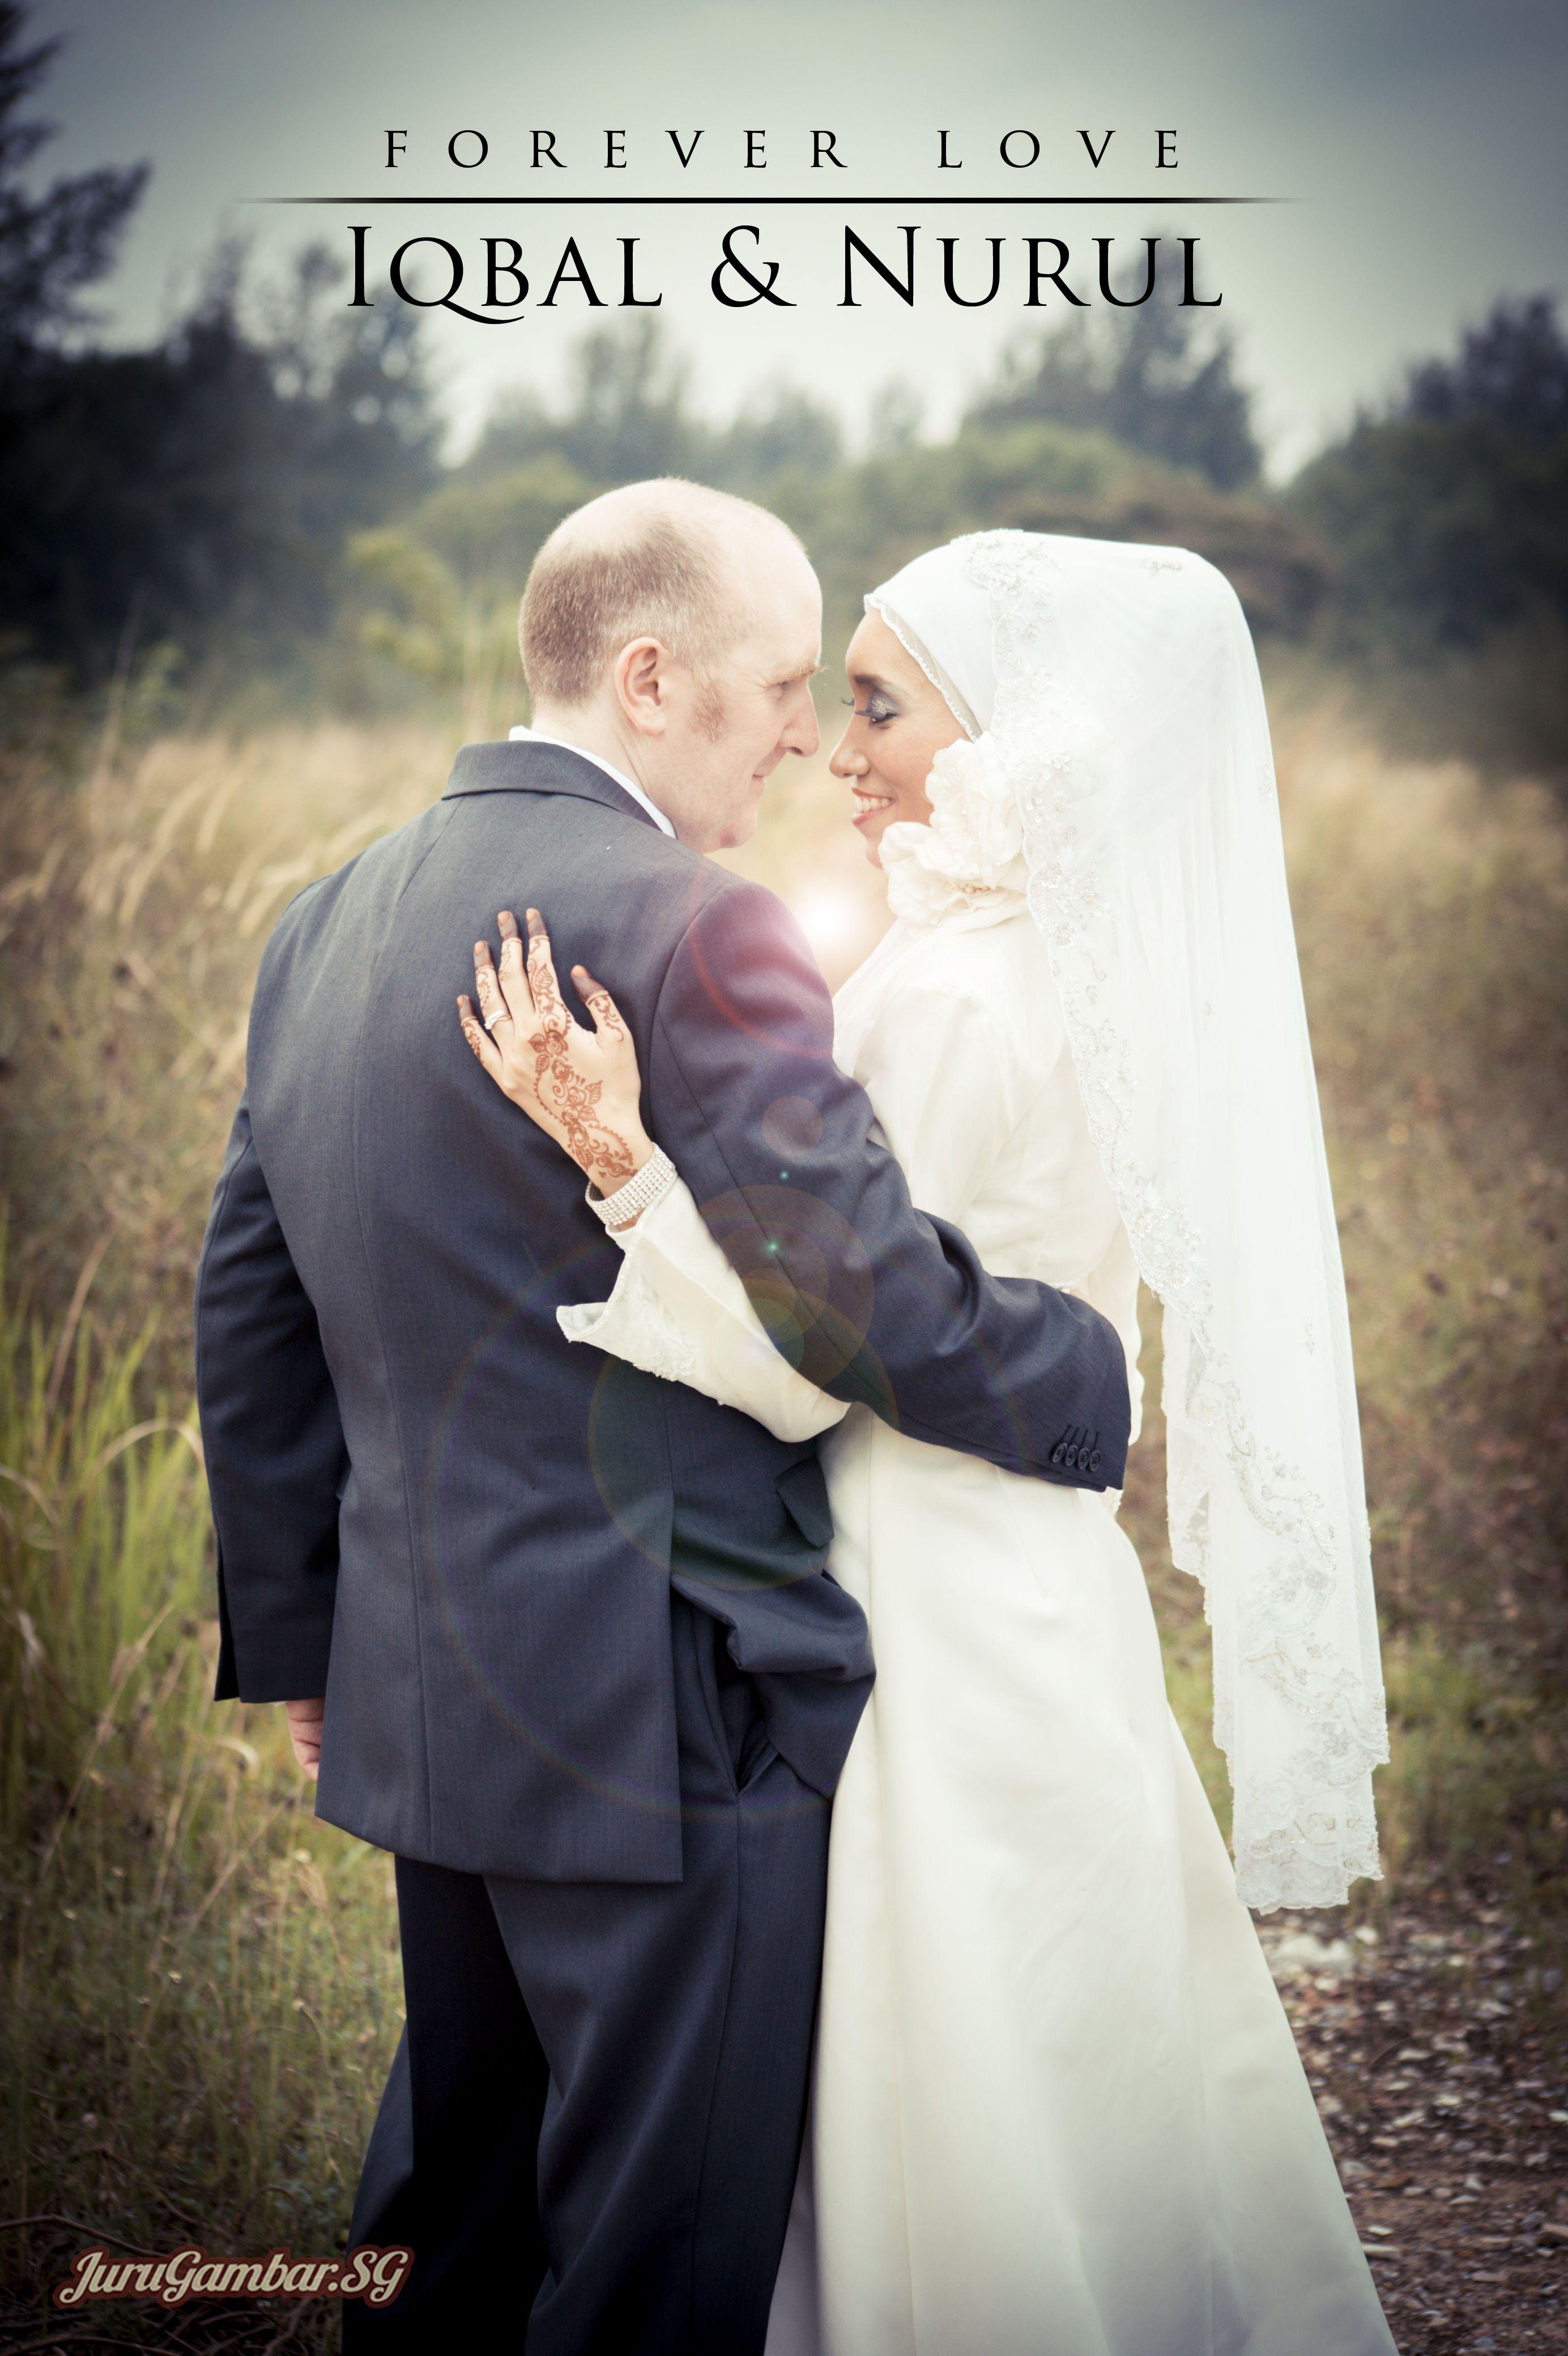 Malay Wedding Photography Singapore Jurugambar Sg Wedding Photography Wedding Poses Malay Wedding